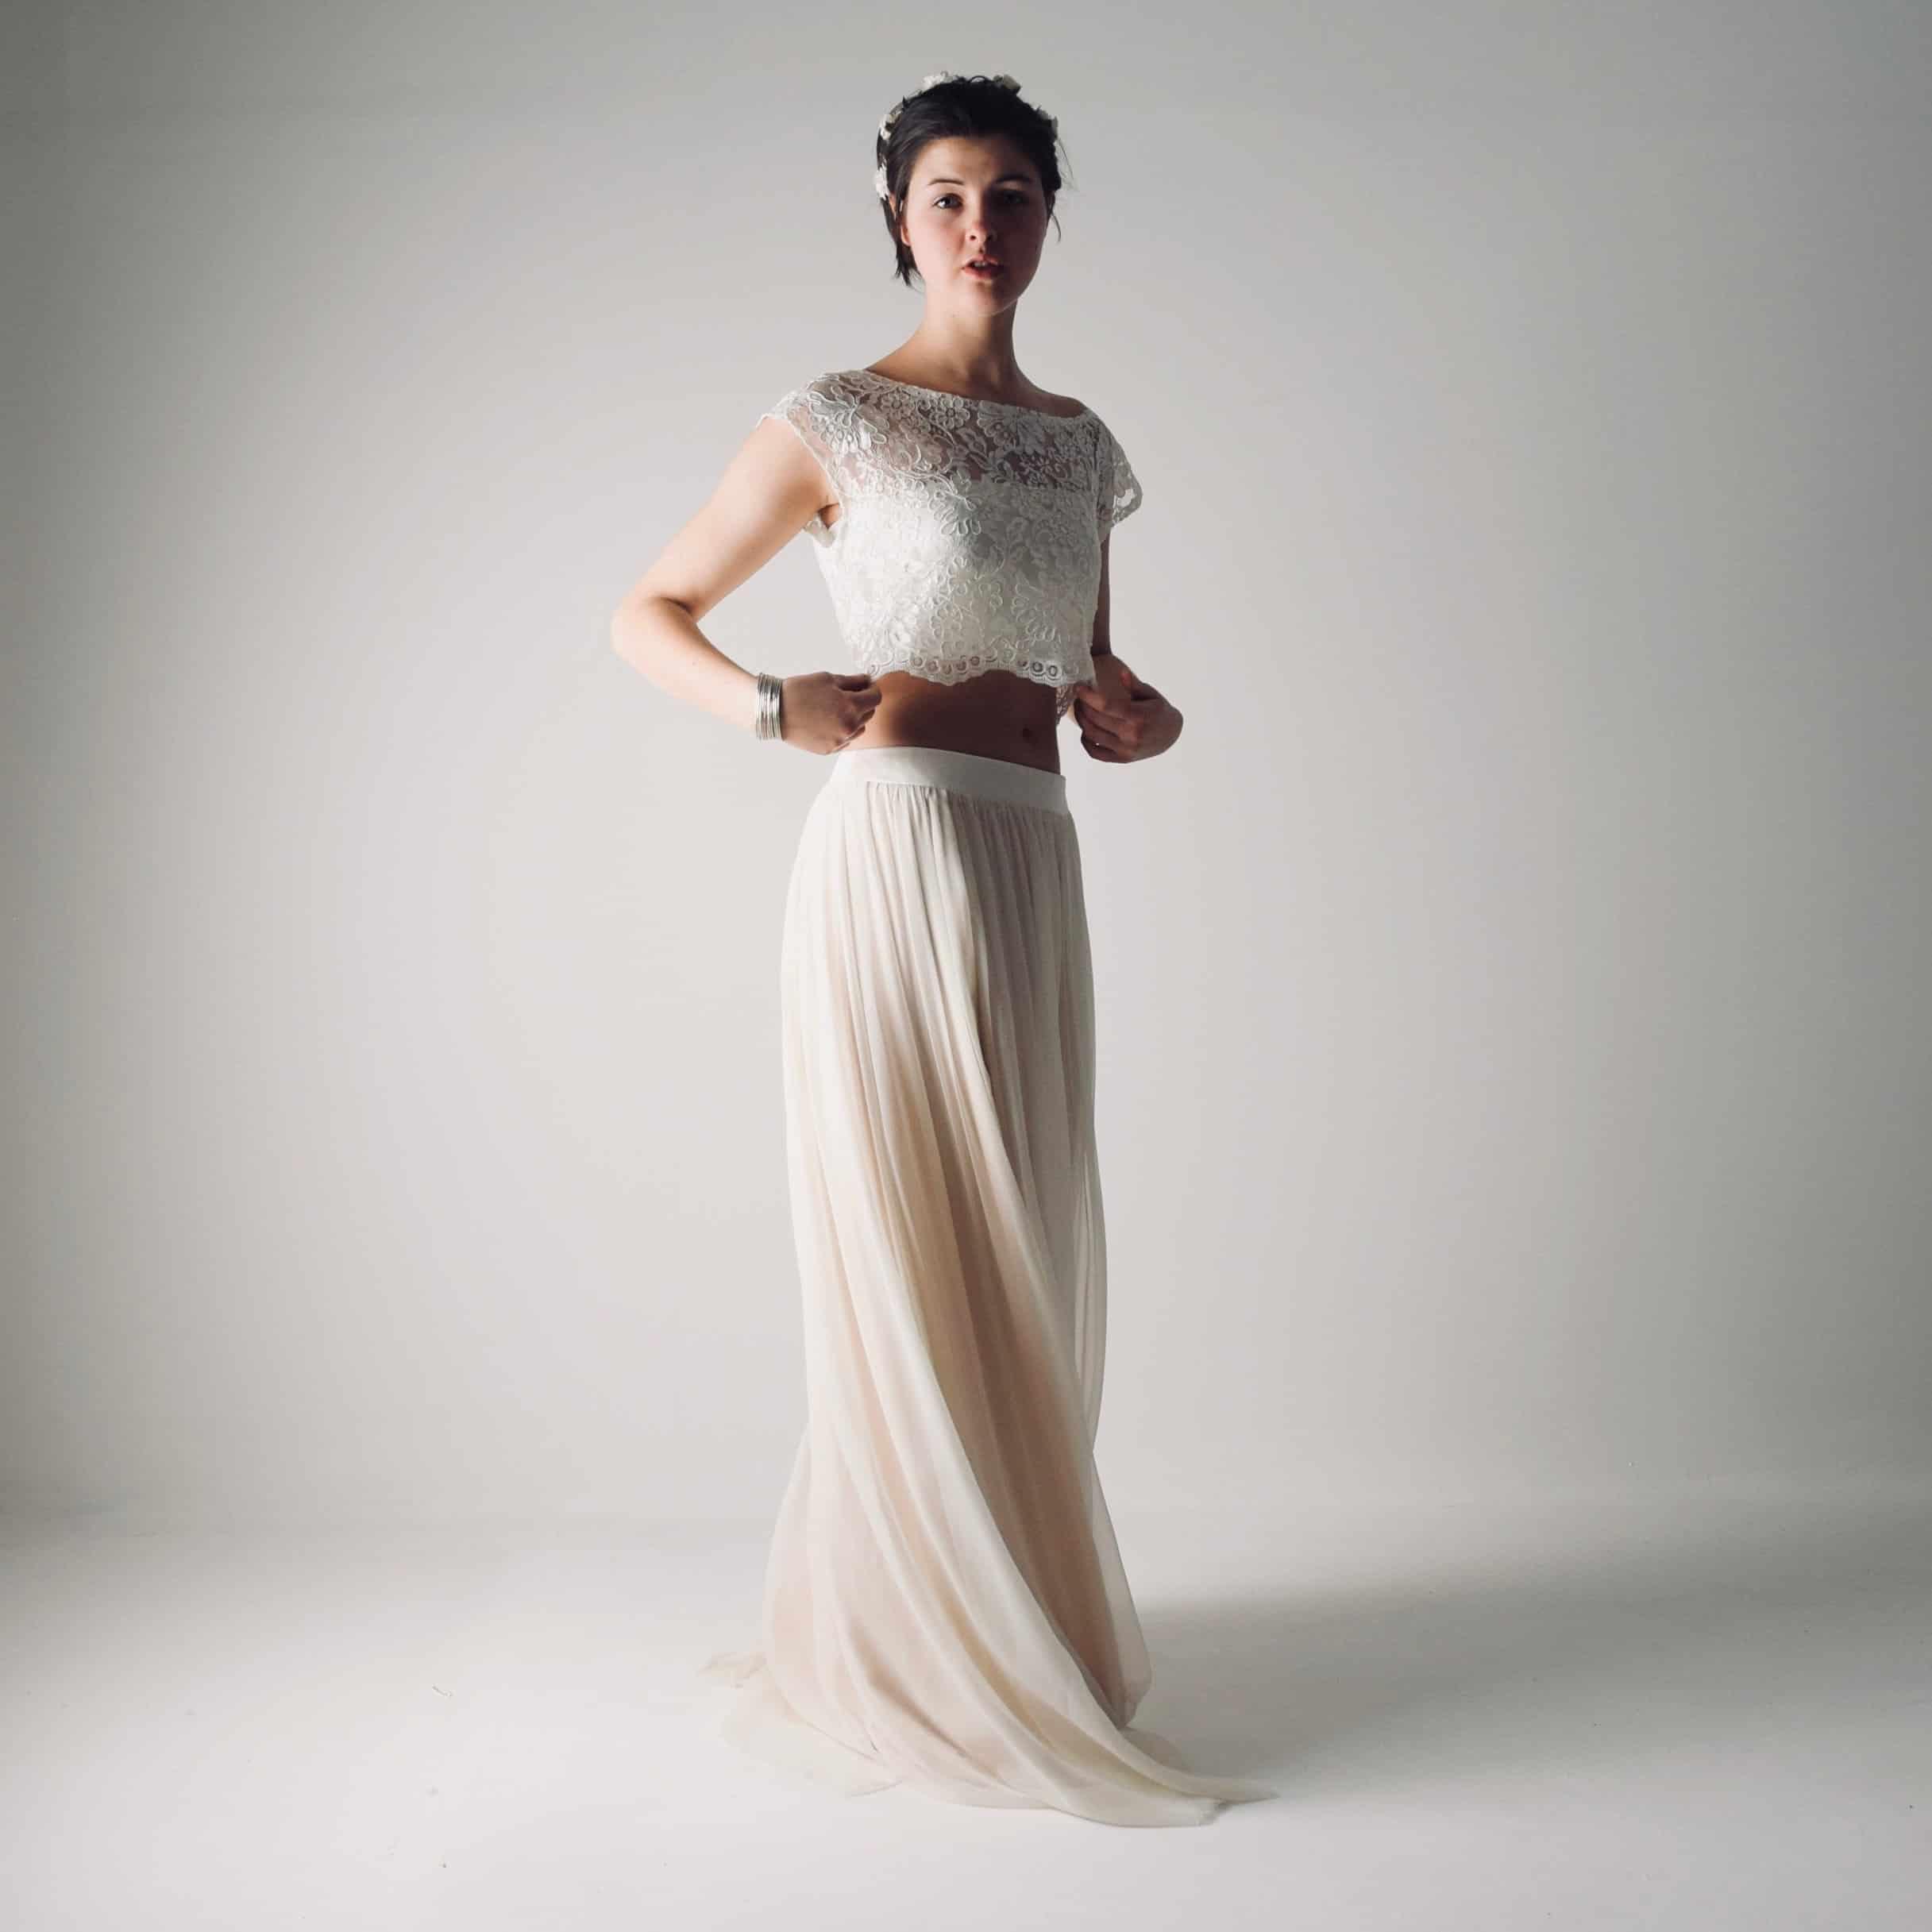 Abiti Cerimonia Hippie.Boho Wedding Dress Separates Hippie Bridal Outfit Larimeloom